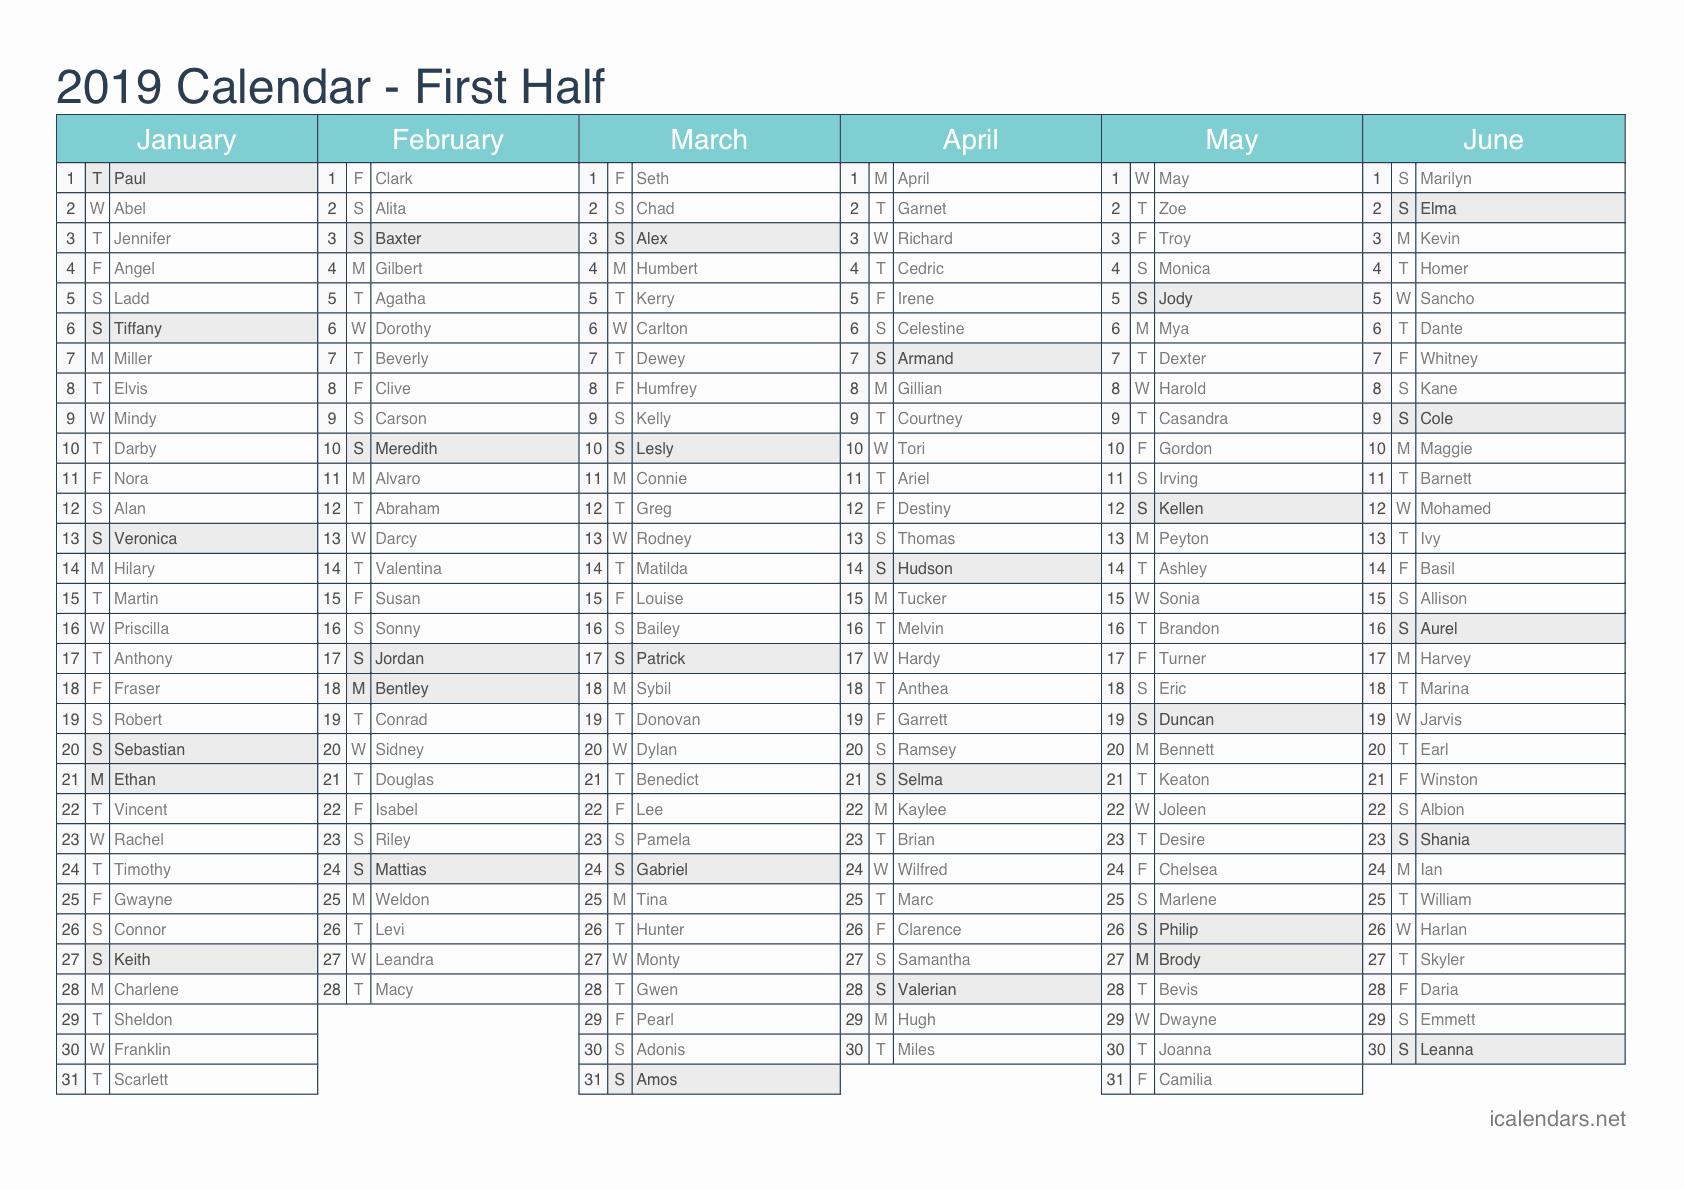 Excel Calendar 2019 Template Fresh 2019 Printable Calendar Pdf or Excel Icalendars